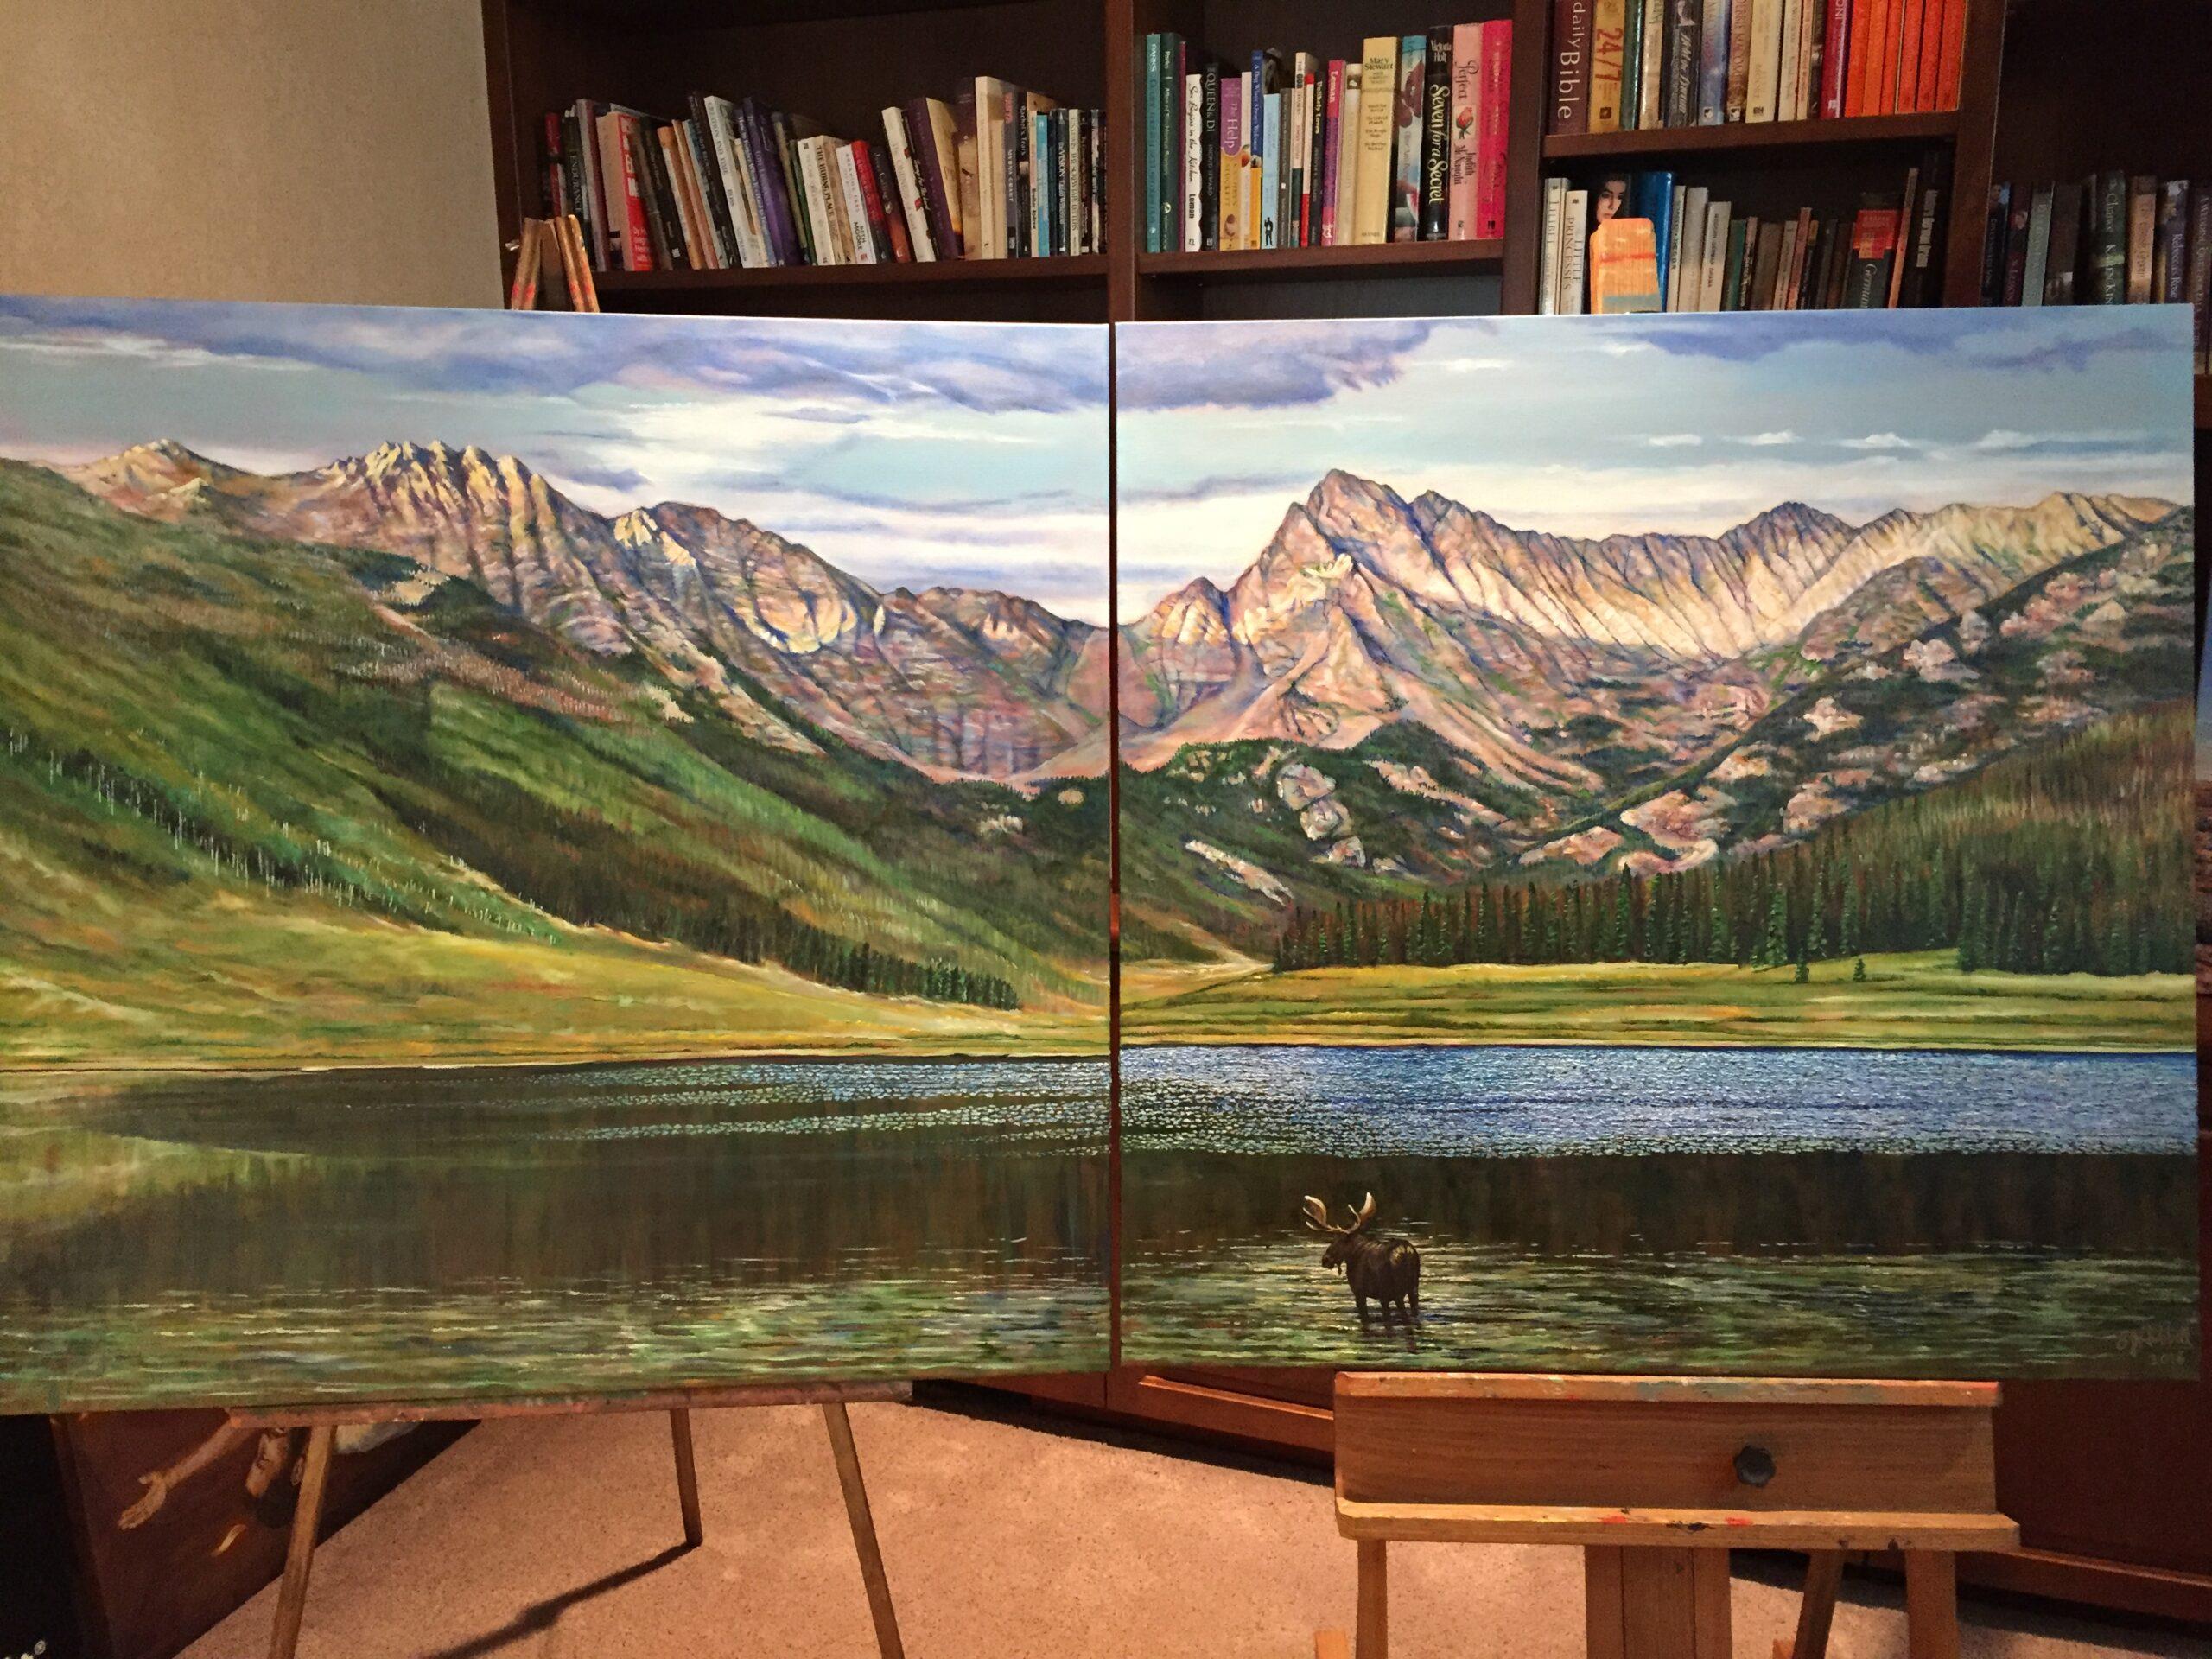 bjh-piney-lake-serenity